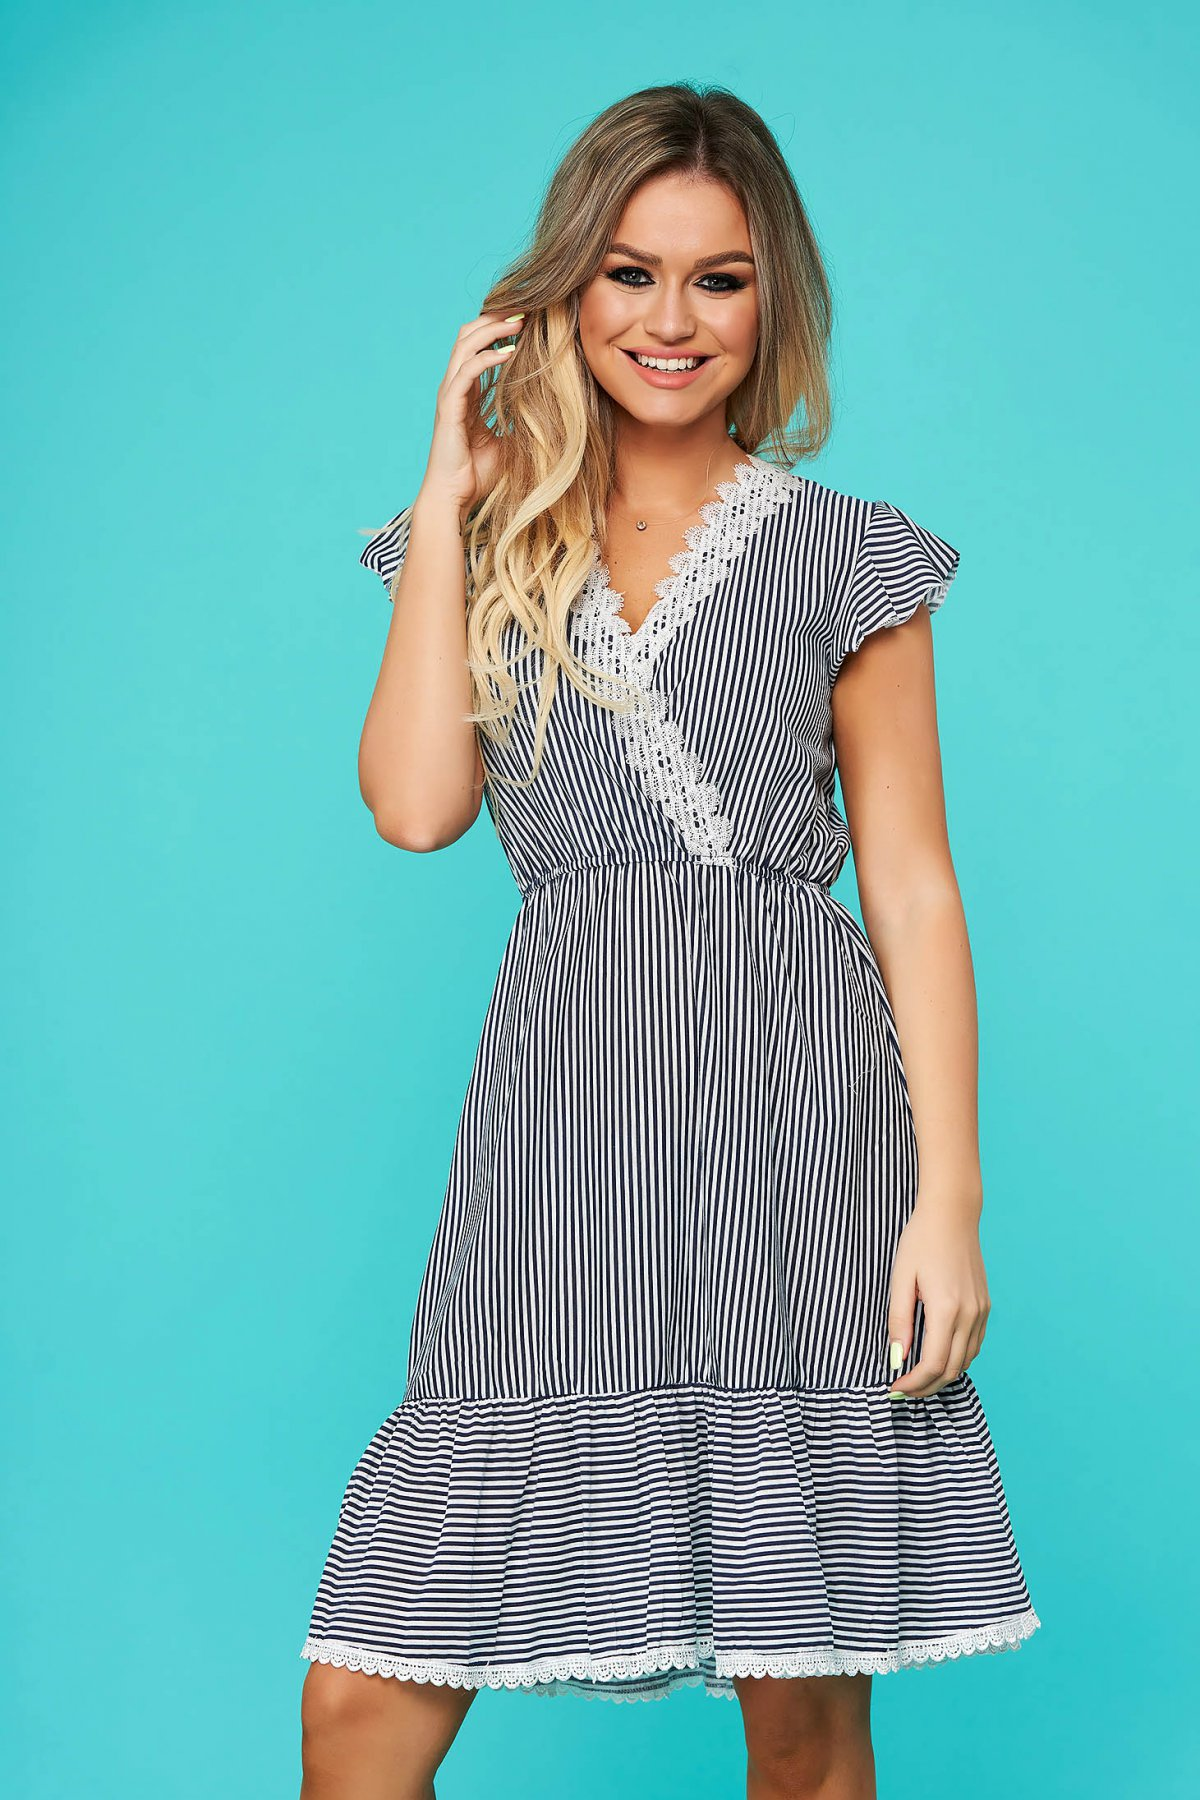 Rochie SunShine albastru-inchis de zi clos cu elastic in talie cu decolteu in v cu aplicatii de dantela cu volanase la baza rochiei